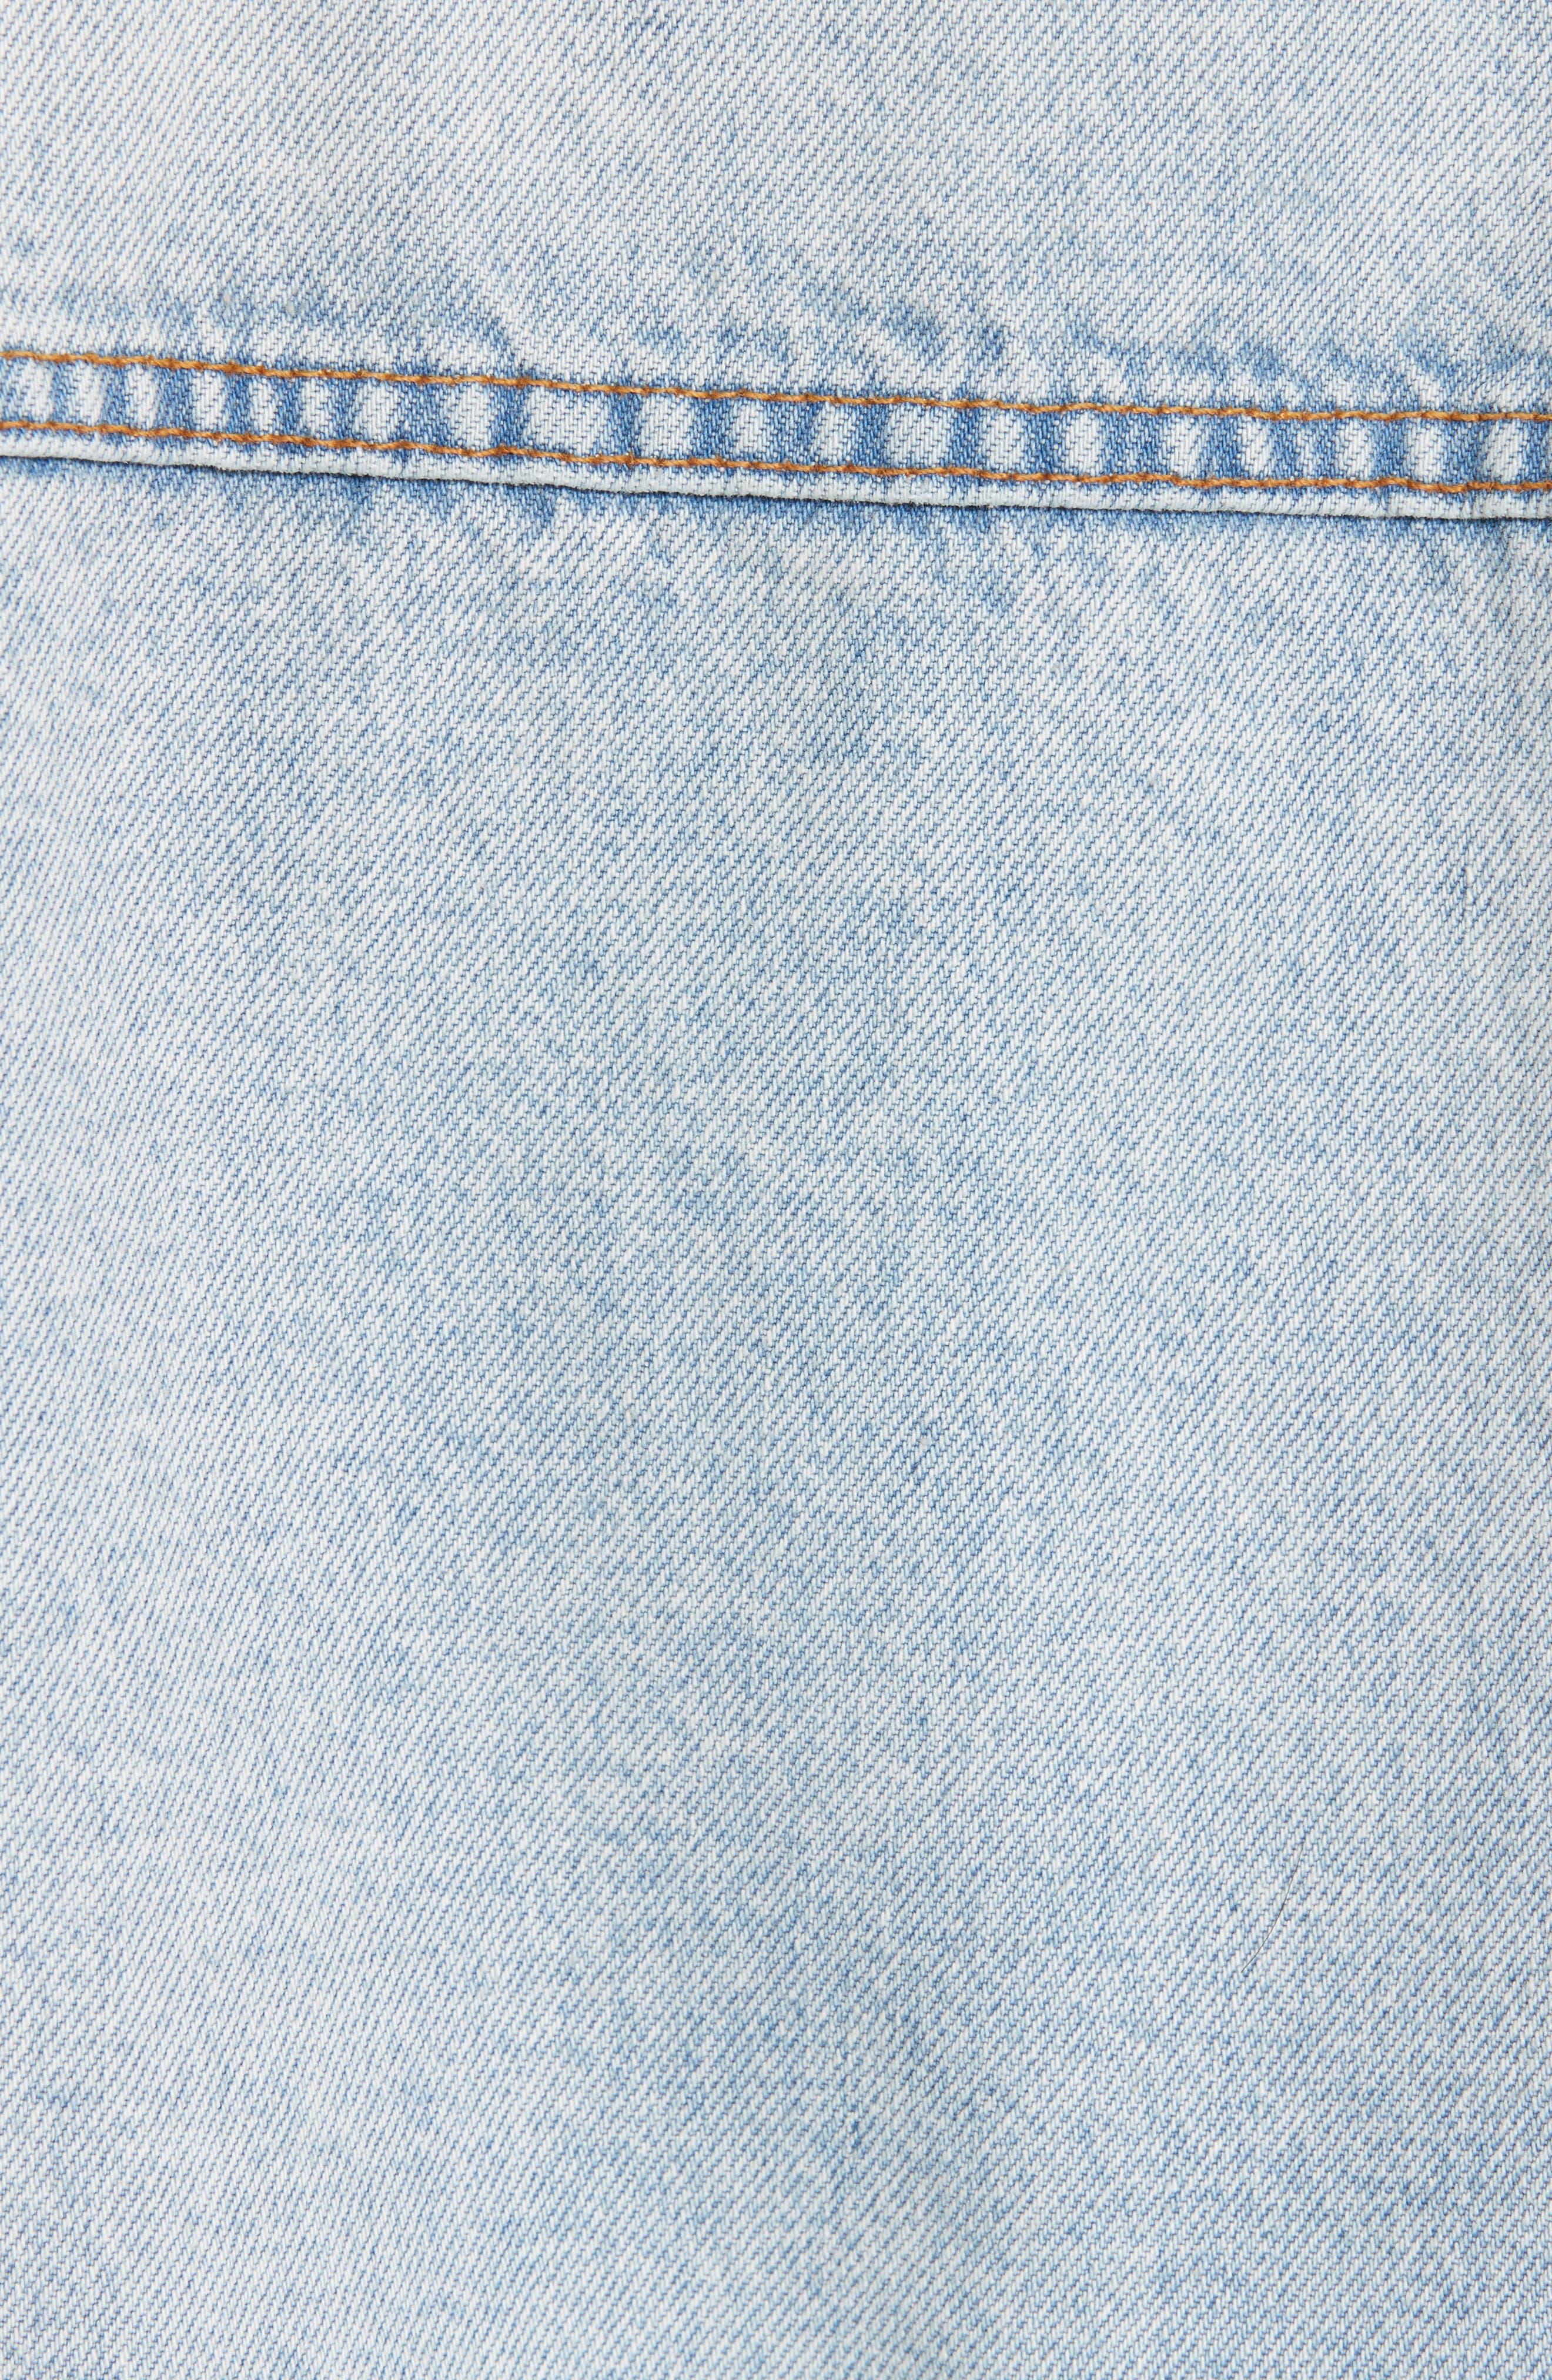 Denim x Alexander Wang Daze Bleach Oversize Denim Jacket,                             Alternate thumbnail 5, color,